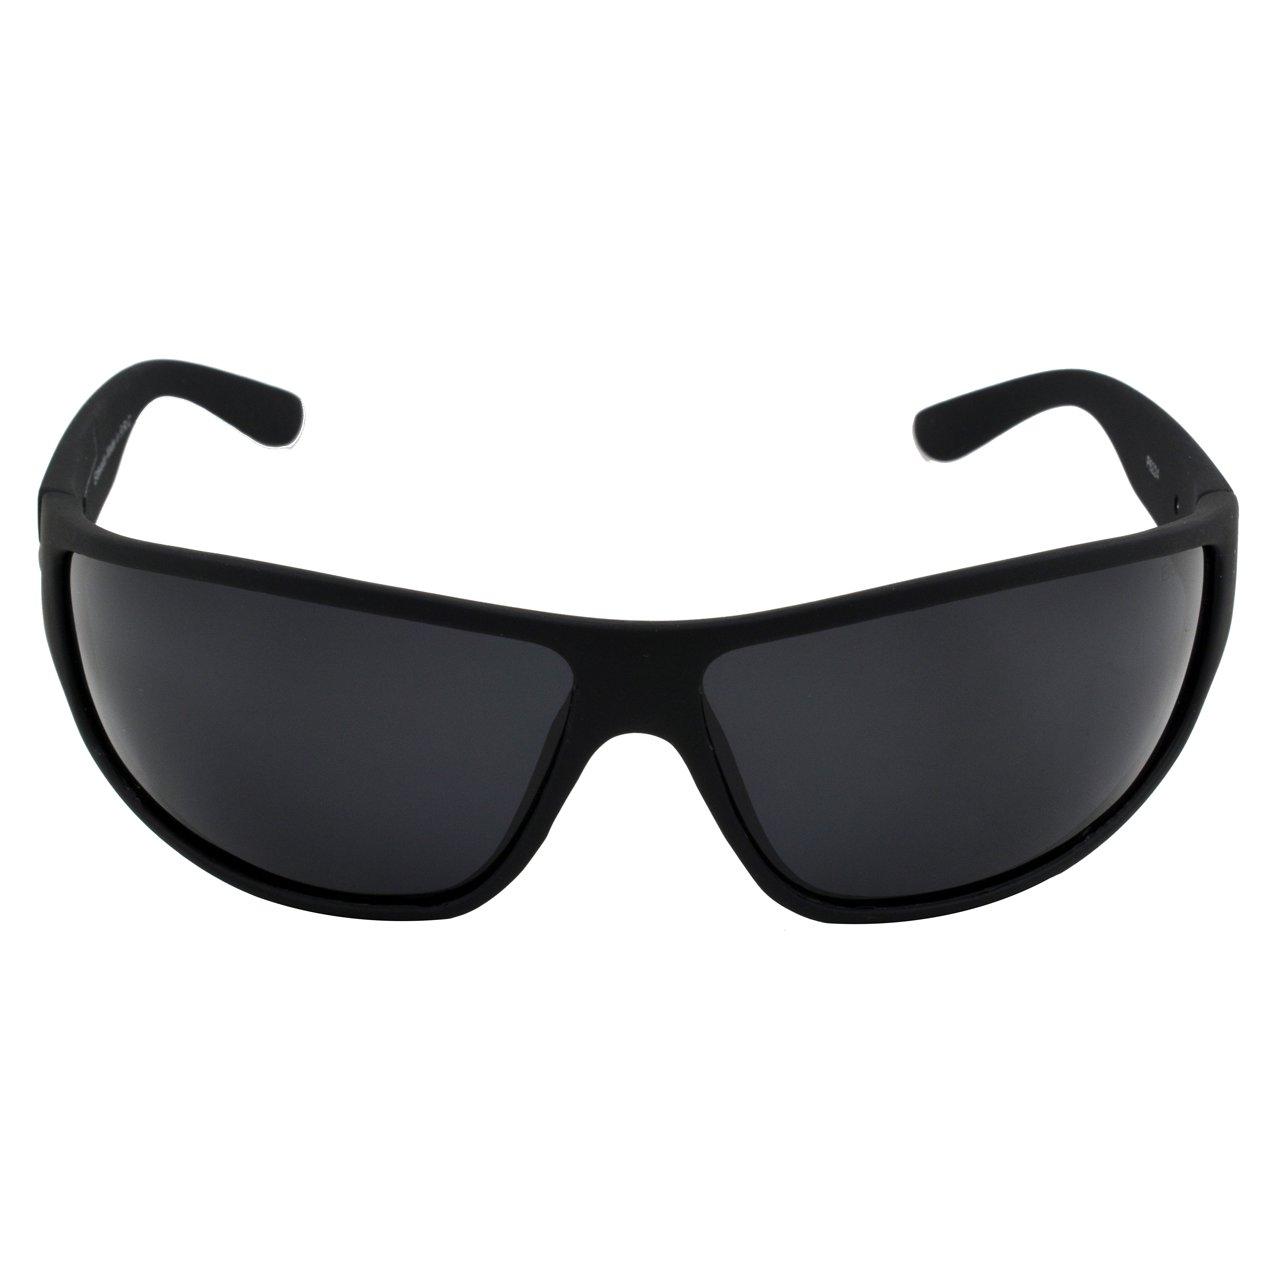 قیمت عینک آفتابی الدرادو مدل Full Frame Matte Black